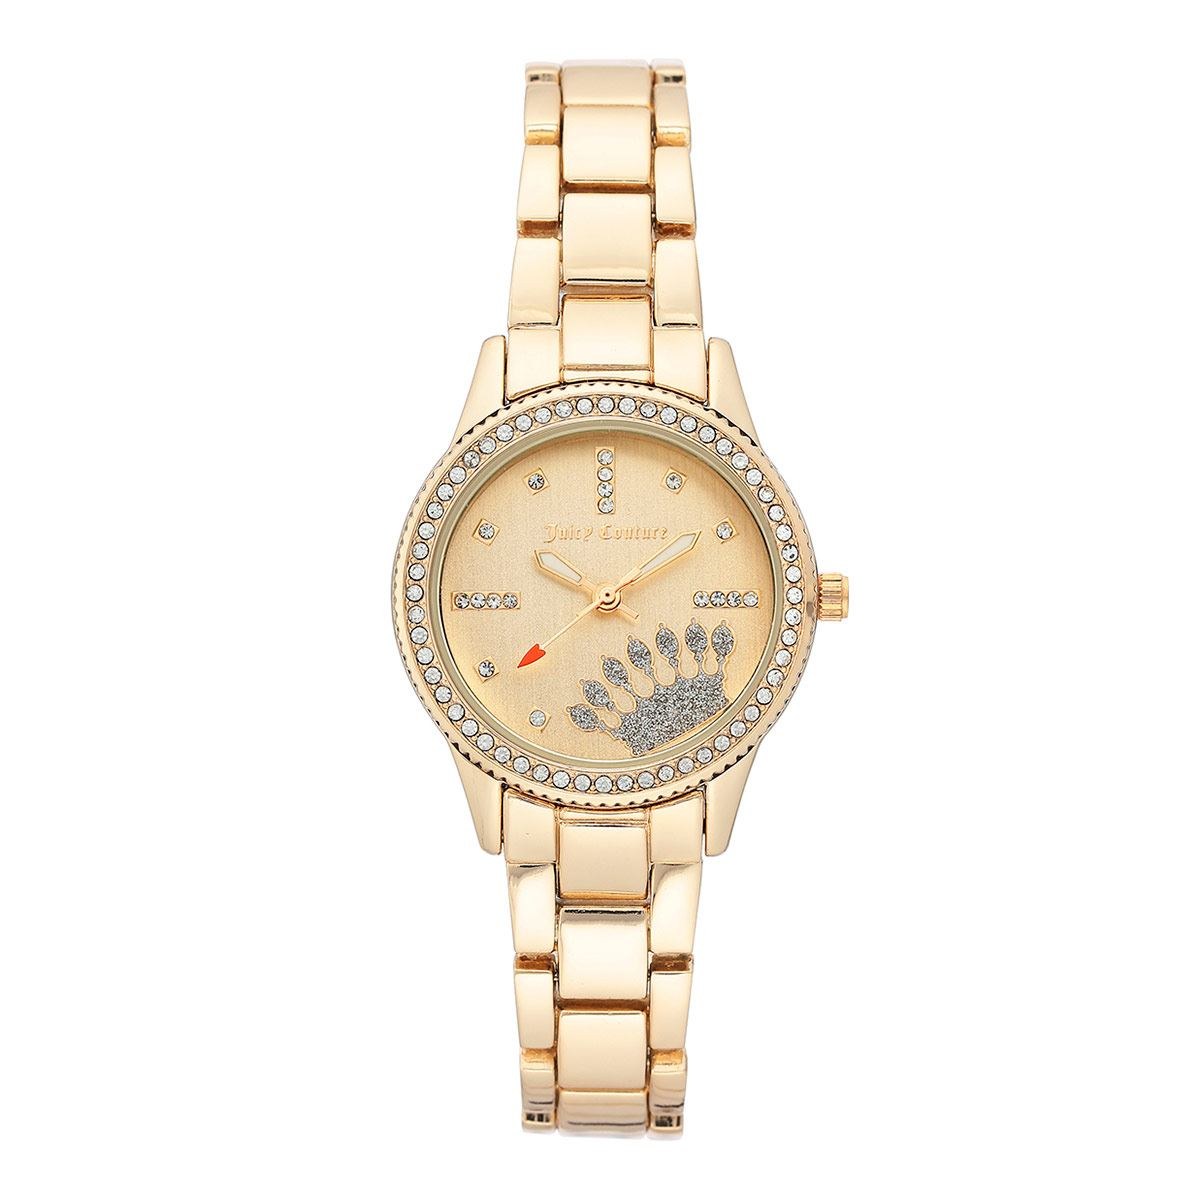 Reloj Juicy Couture Dorado JC1110CHGB Para Dama